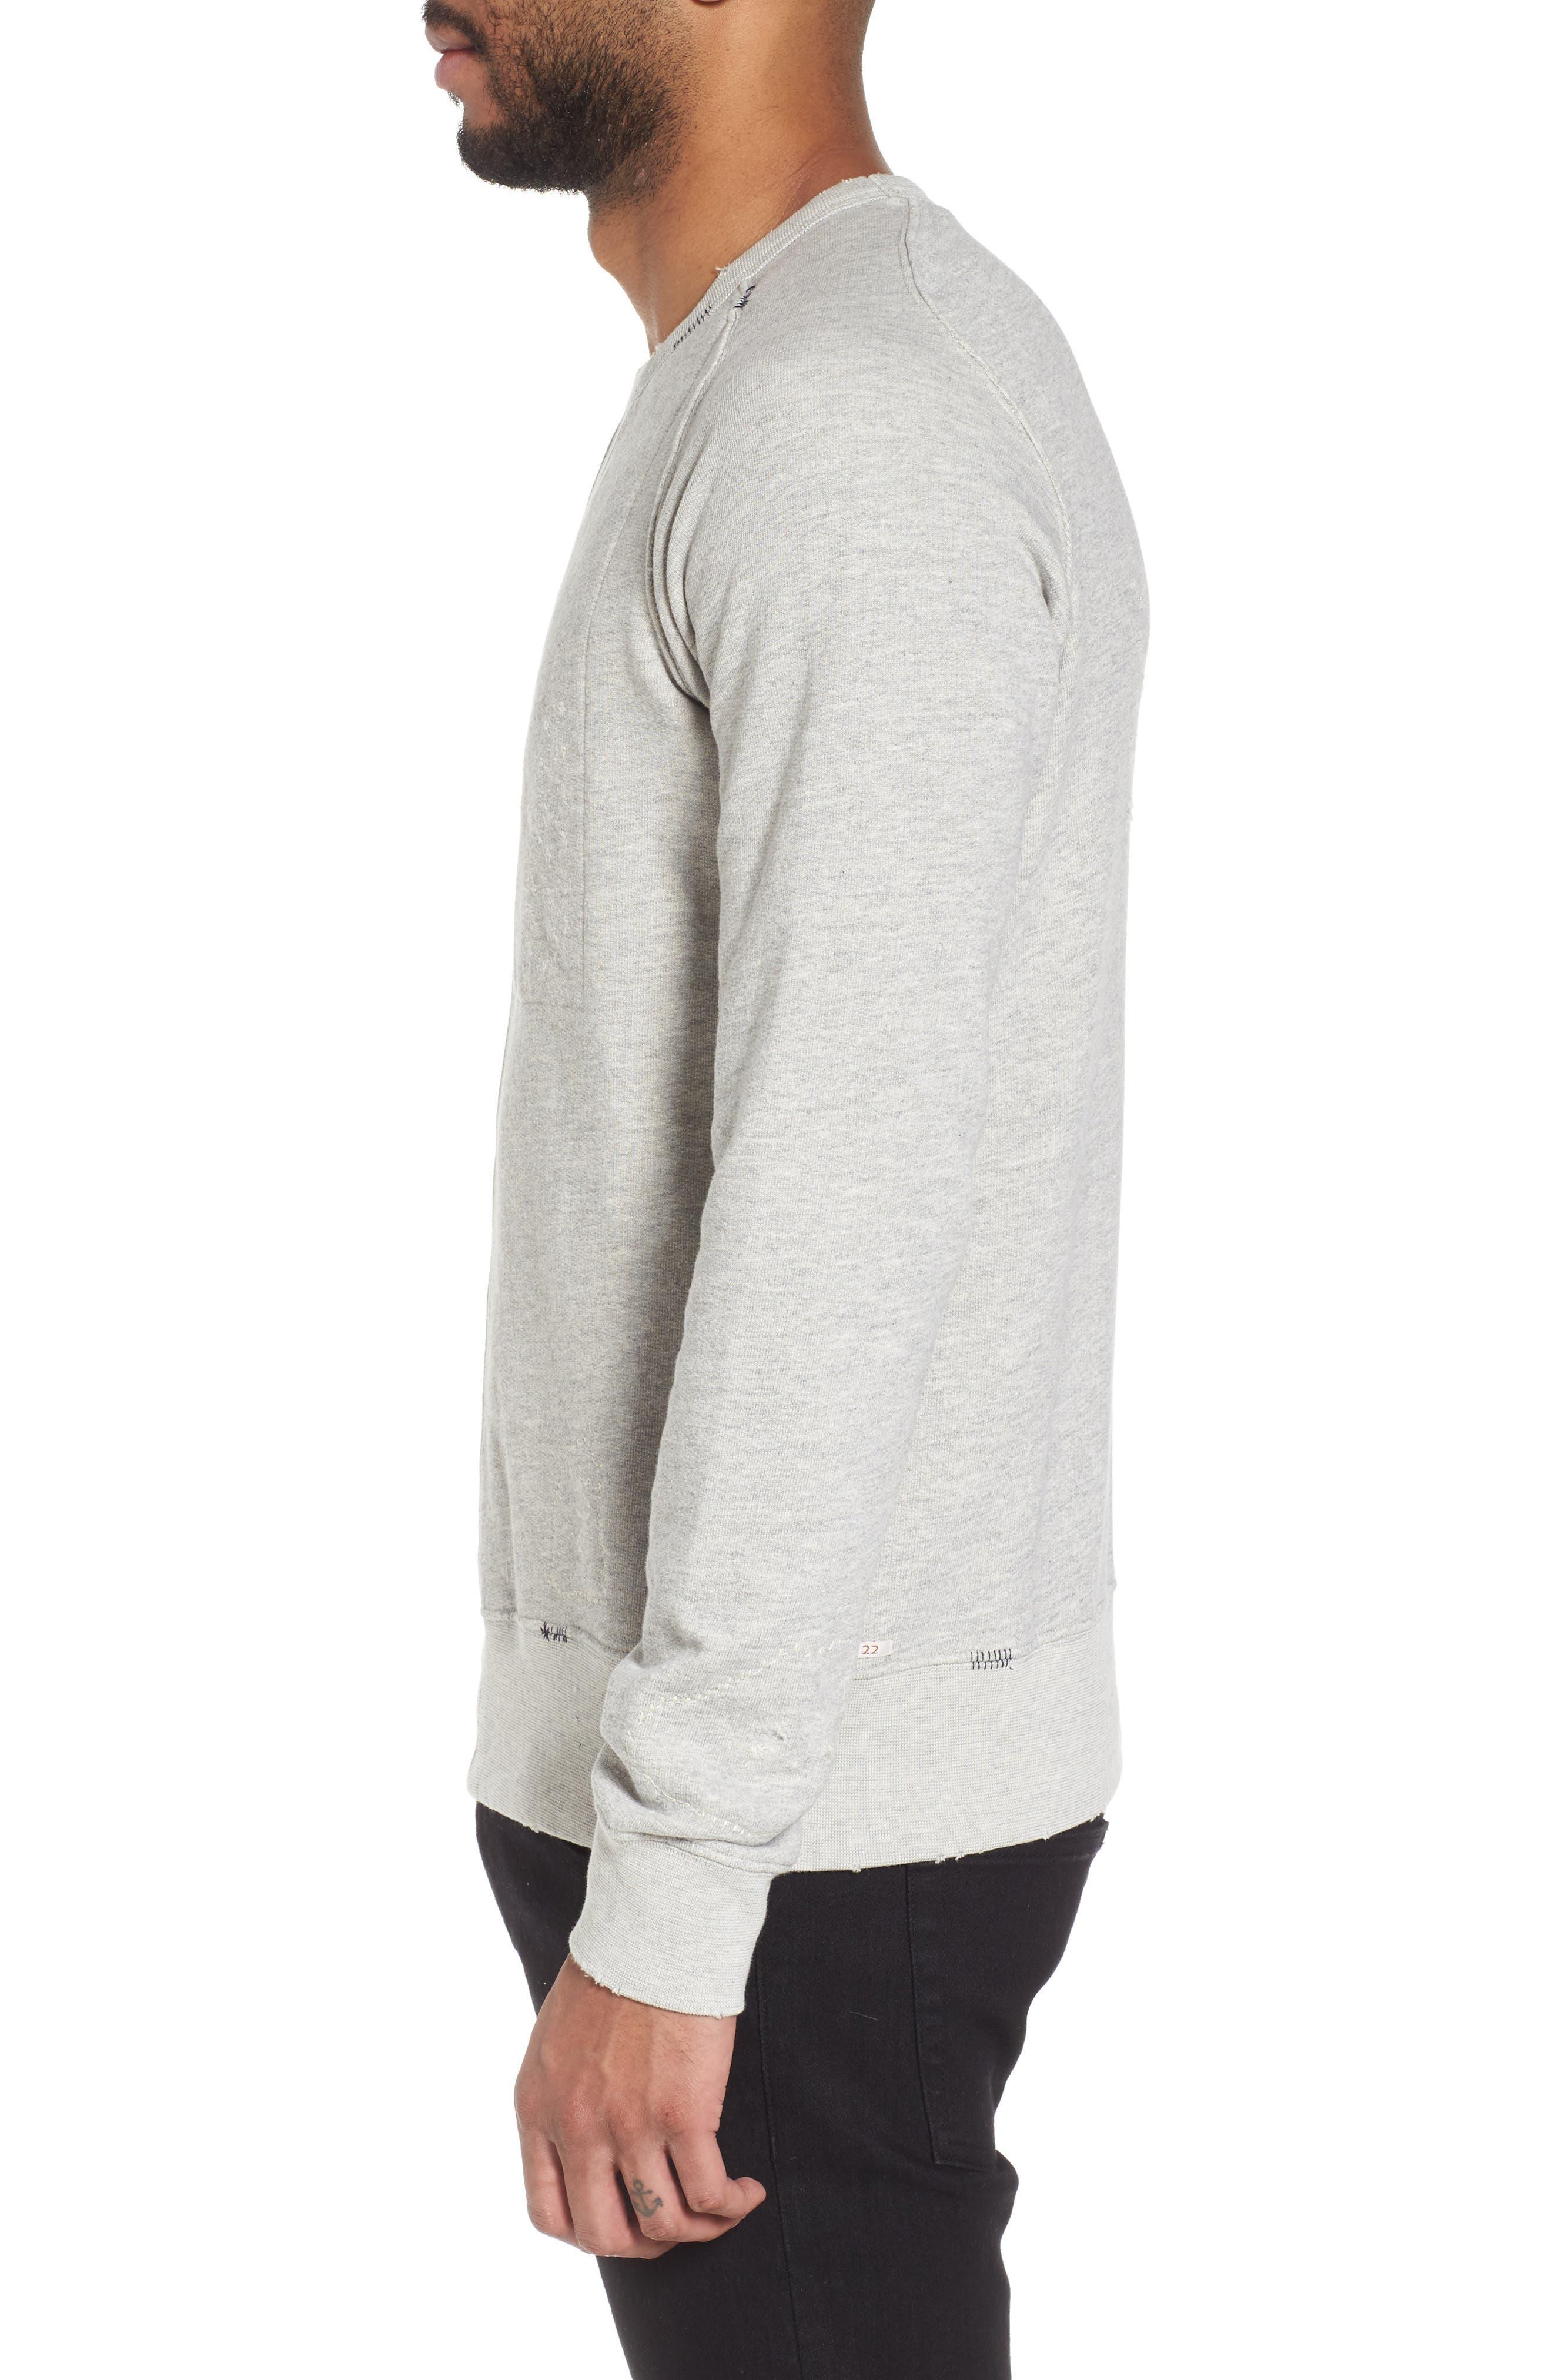 Lot 22 Sweatshirt,                             Alternate thumbnail 3, color,                             450